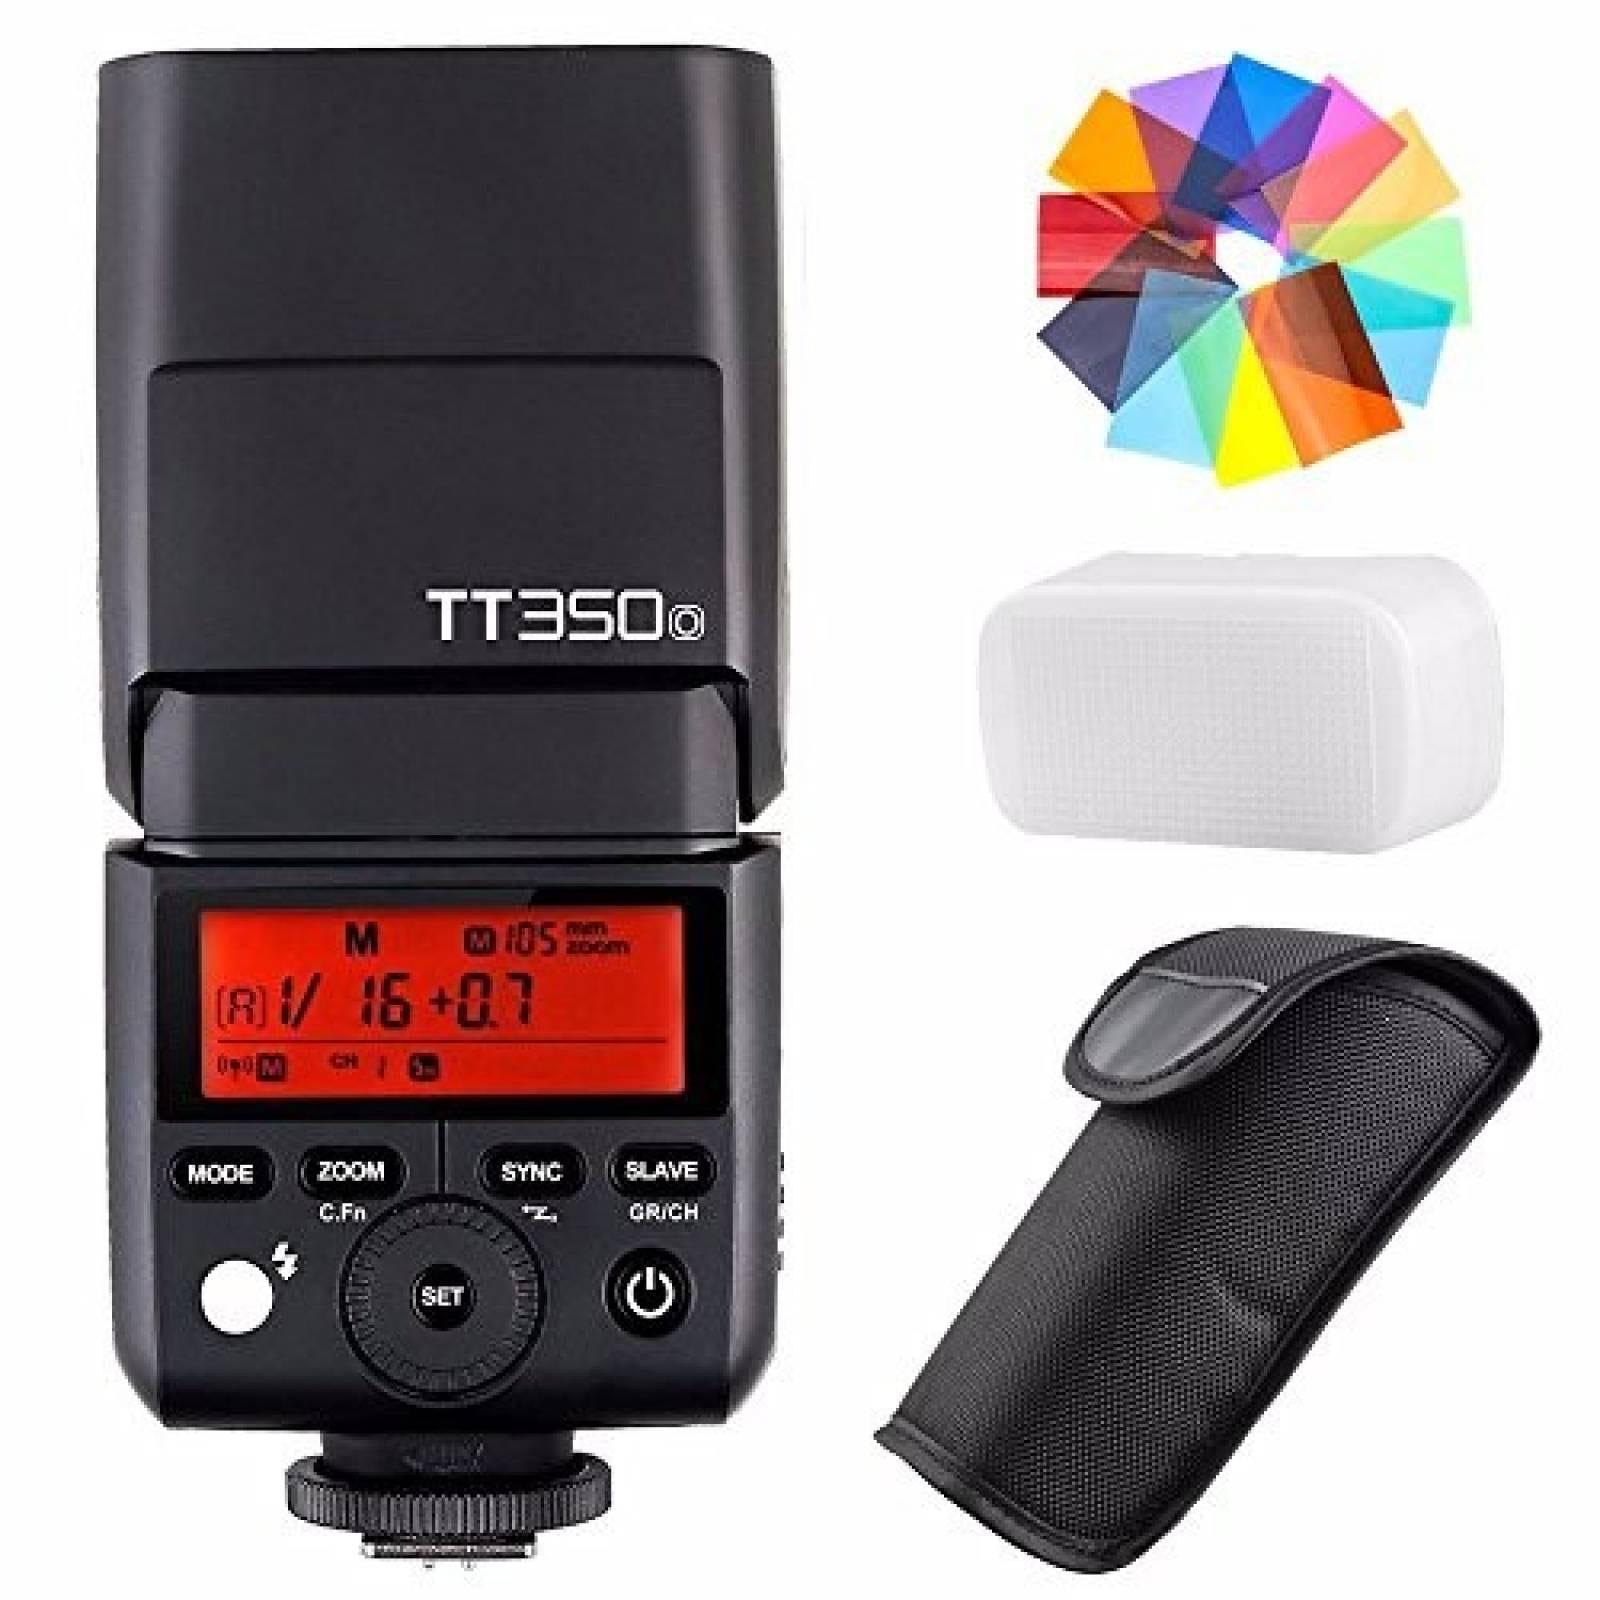 Speedlite Flash Godox TT350O 2.4G HSS 1/8000s para cámara